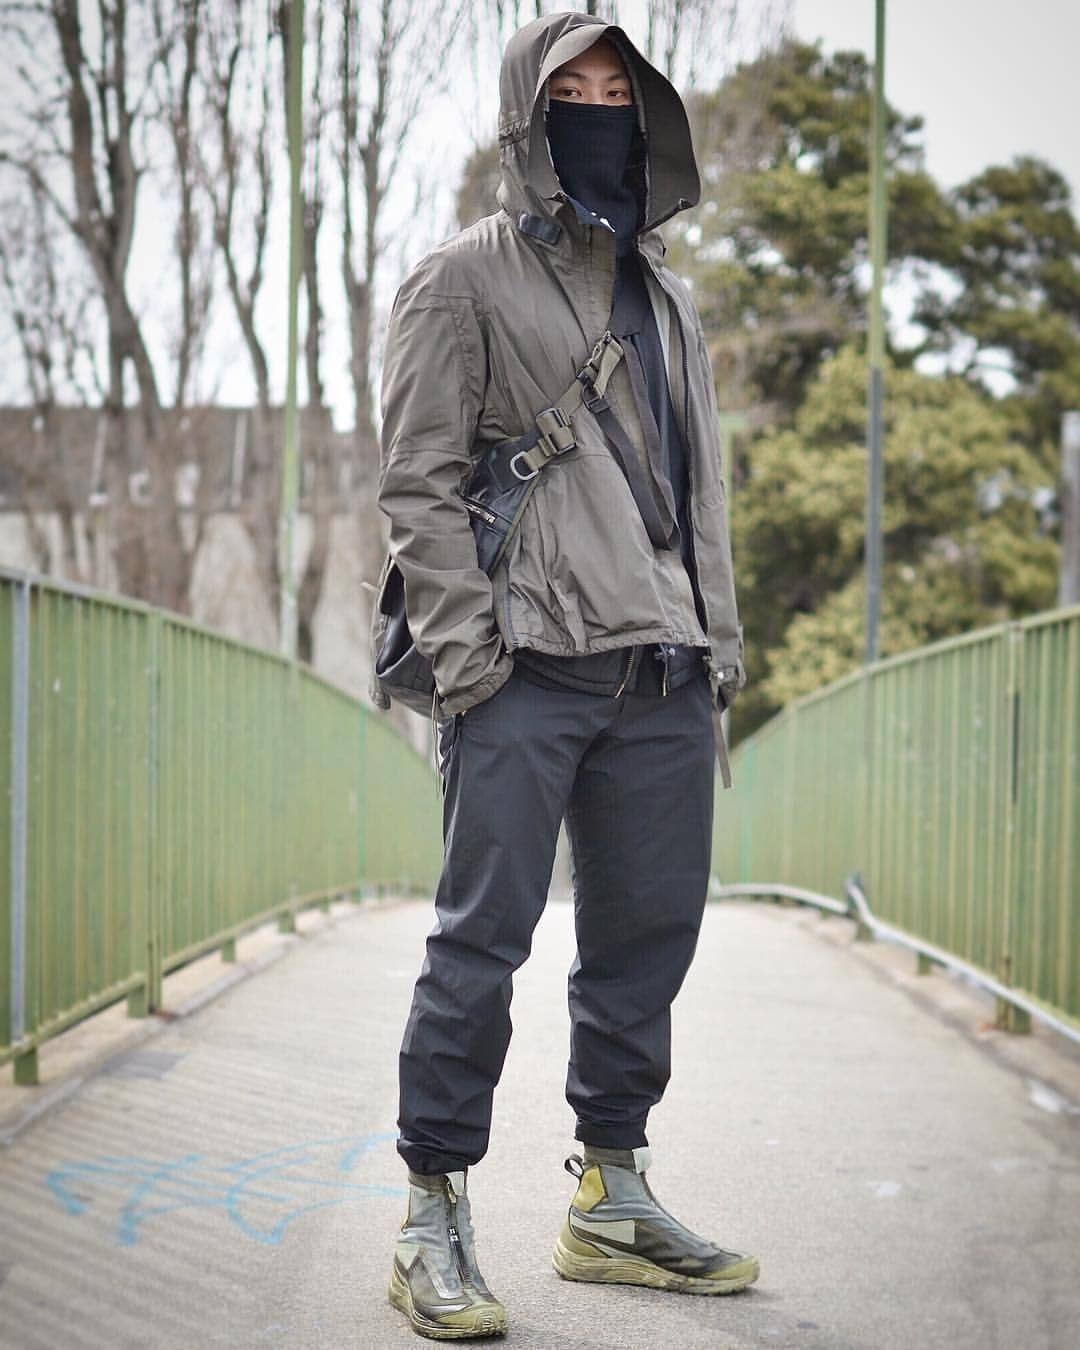 thatslapz  items  techwear  urbanwear  acronym  acrnm  airpresto  nike   nikelab  nikelabacg  nikeacg  acg  salomon  11bybbs 6700fbc9b1ec0